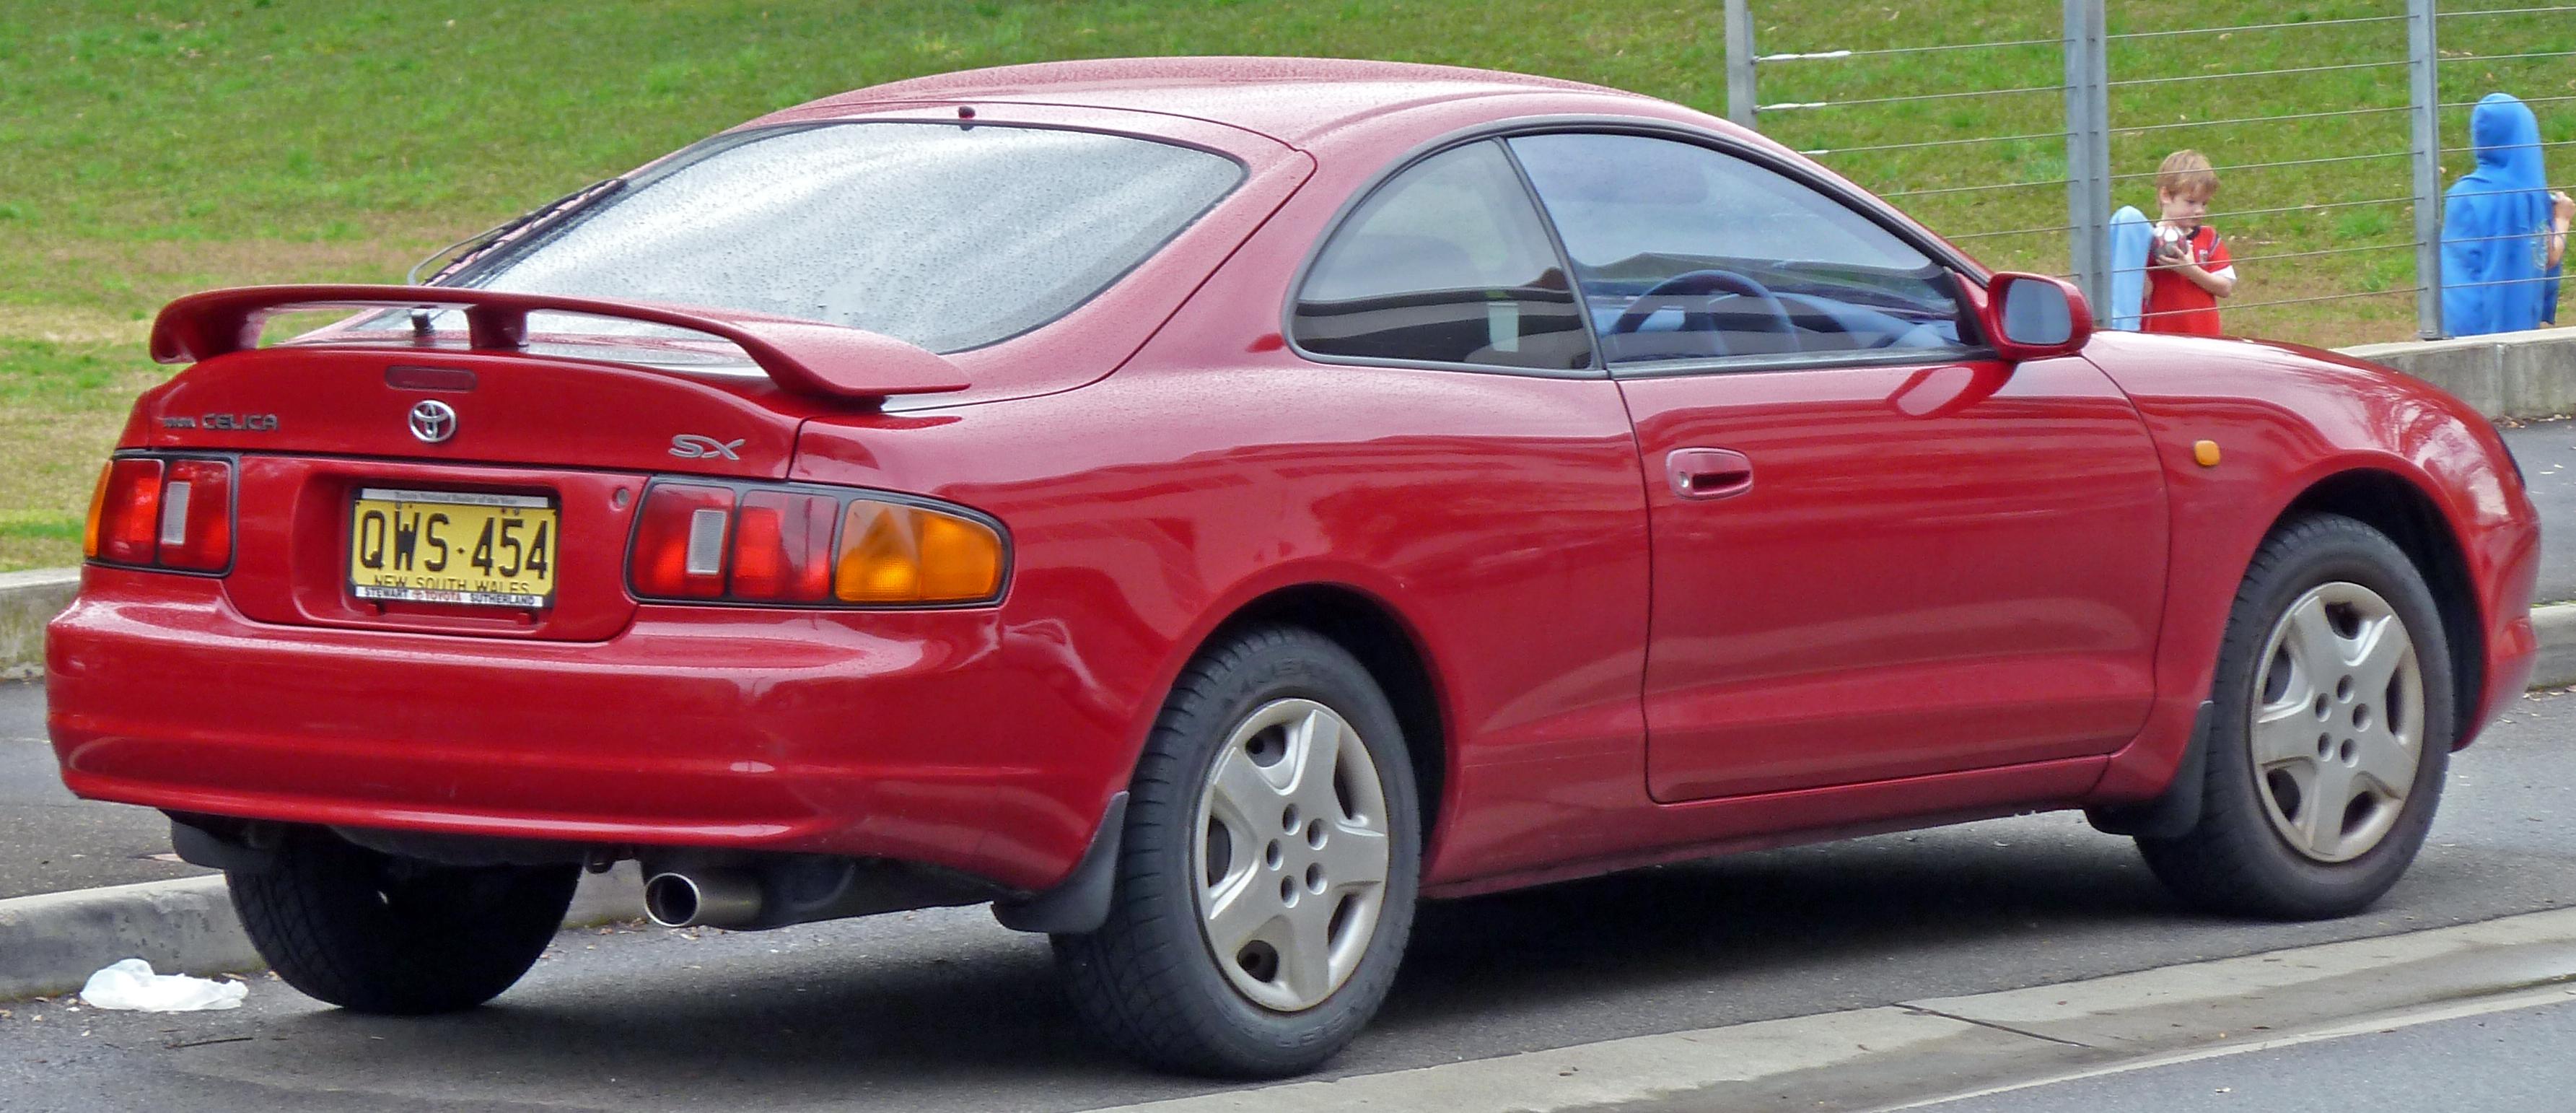 Description 1995-1999 Toyota Celica (ST204R) SX liftback 02.jpg